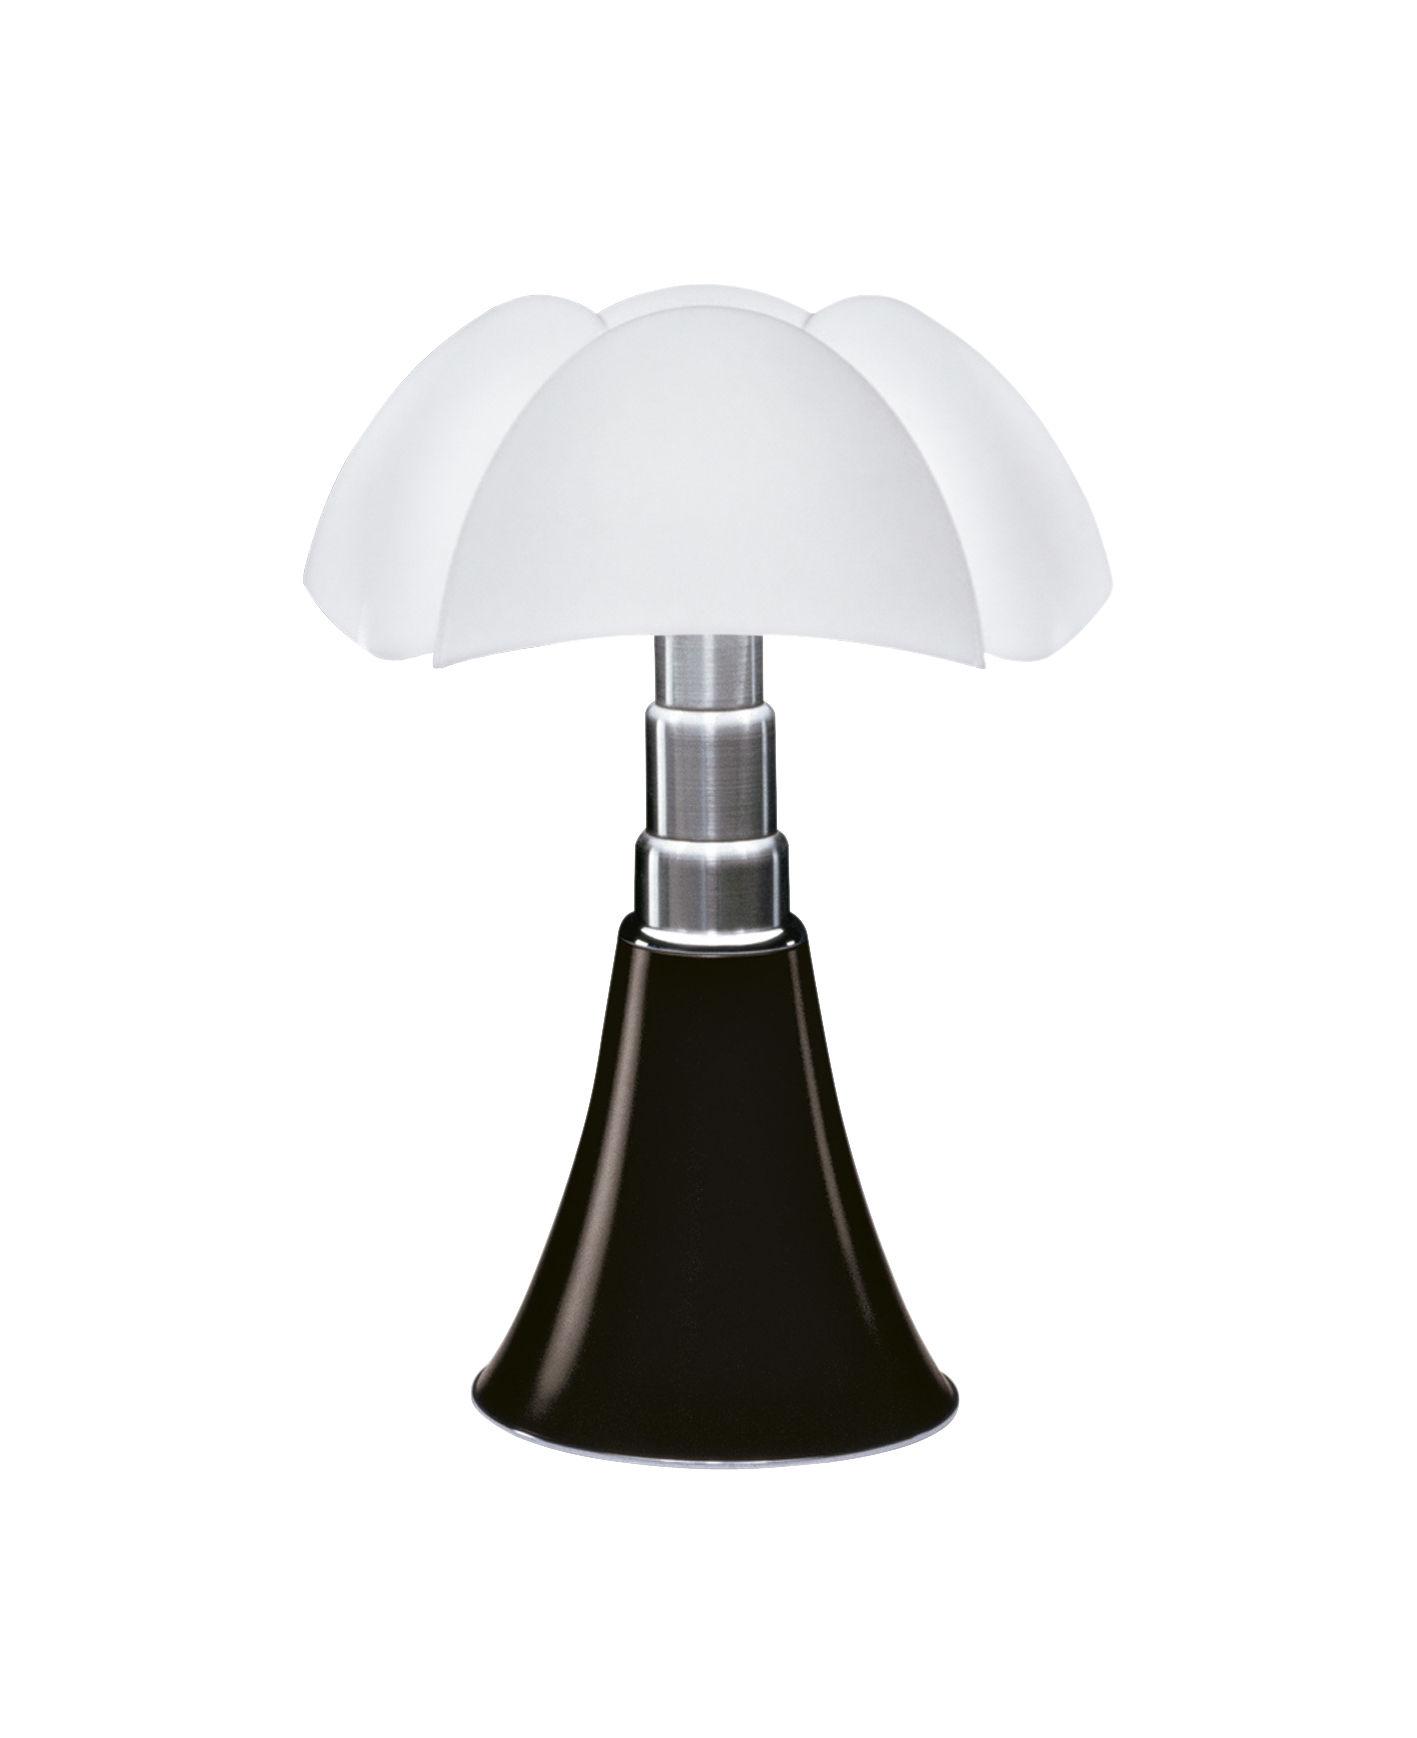 Lampe De Table Minipipistrello LED H 35 Cm Marron Fonc